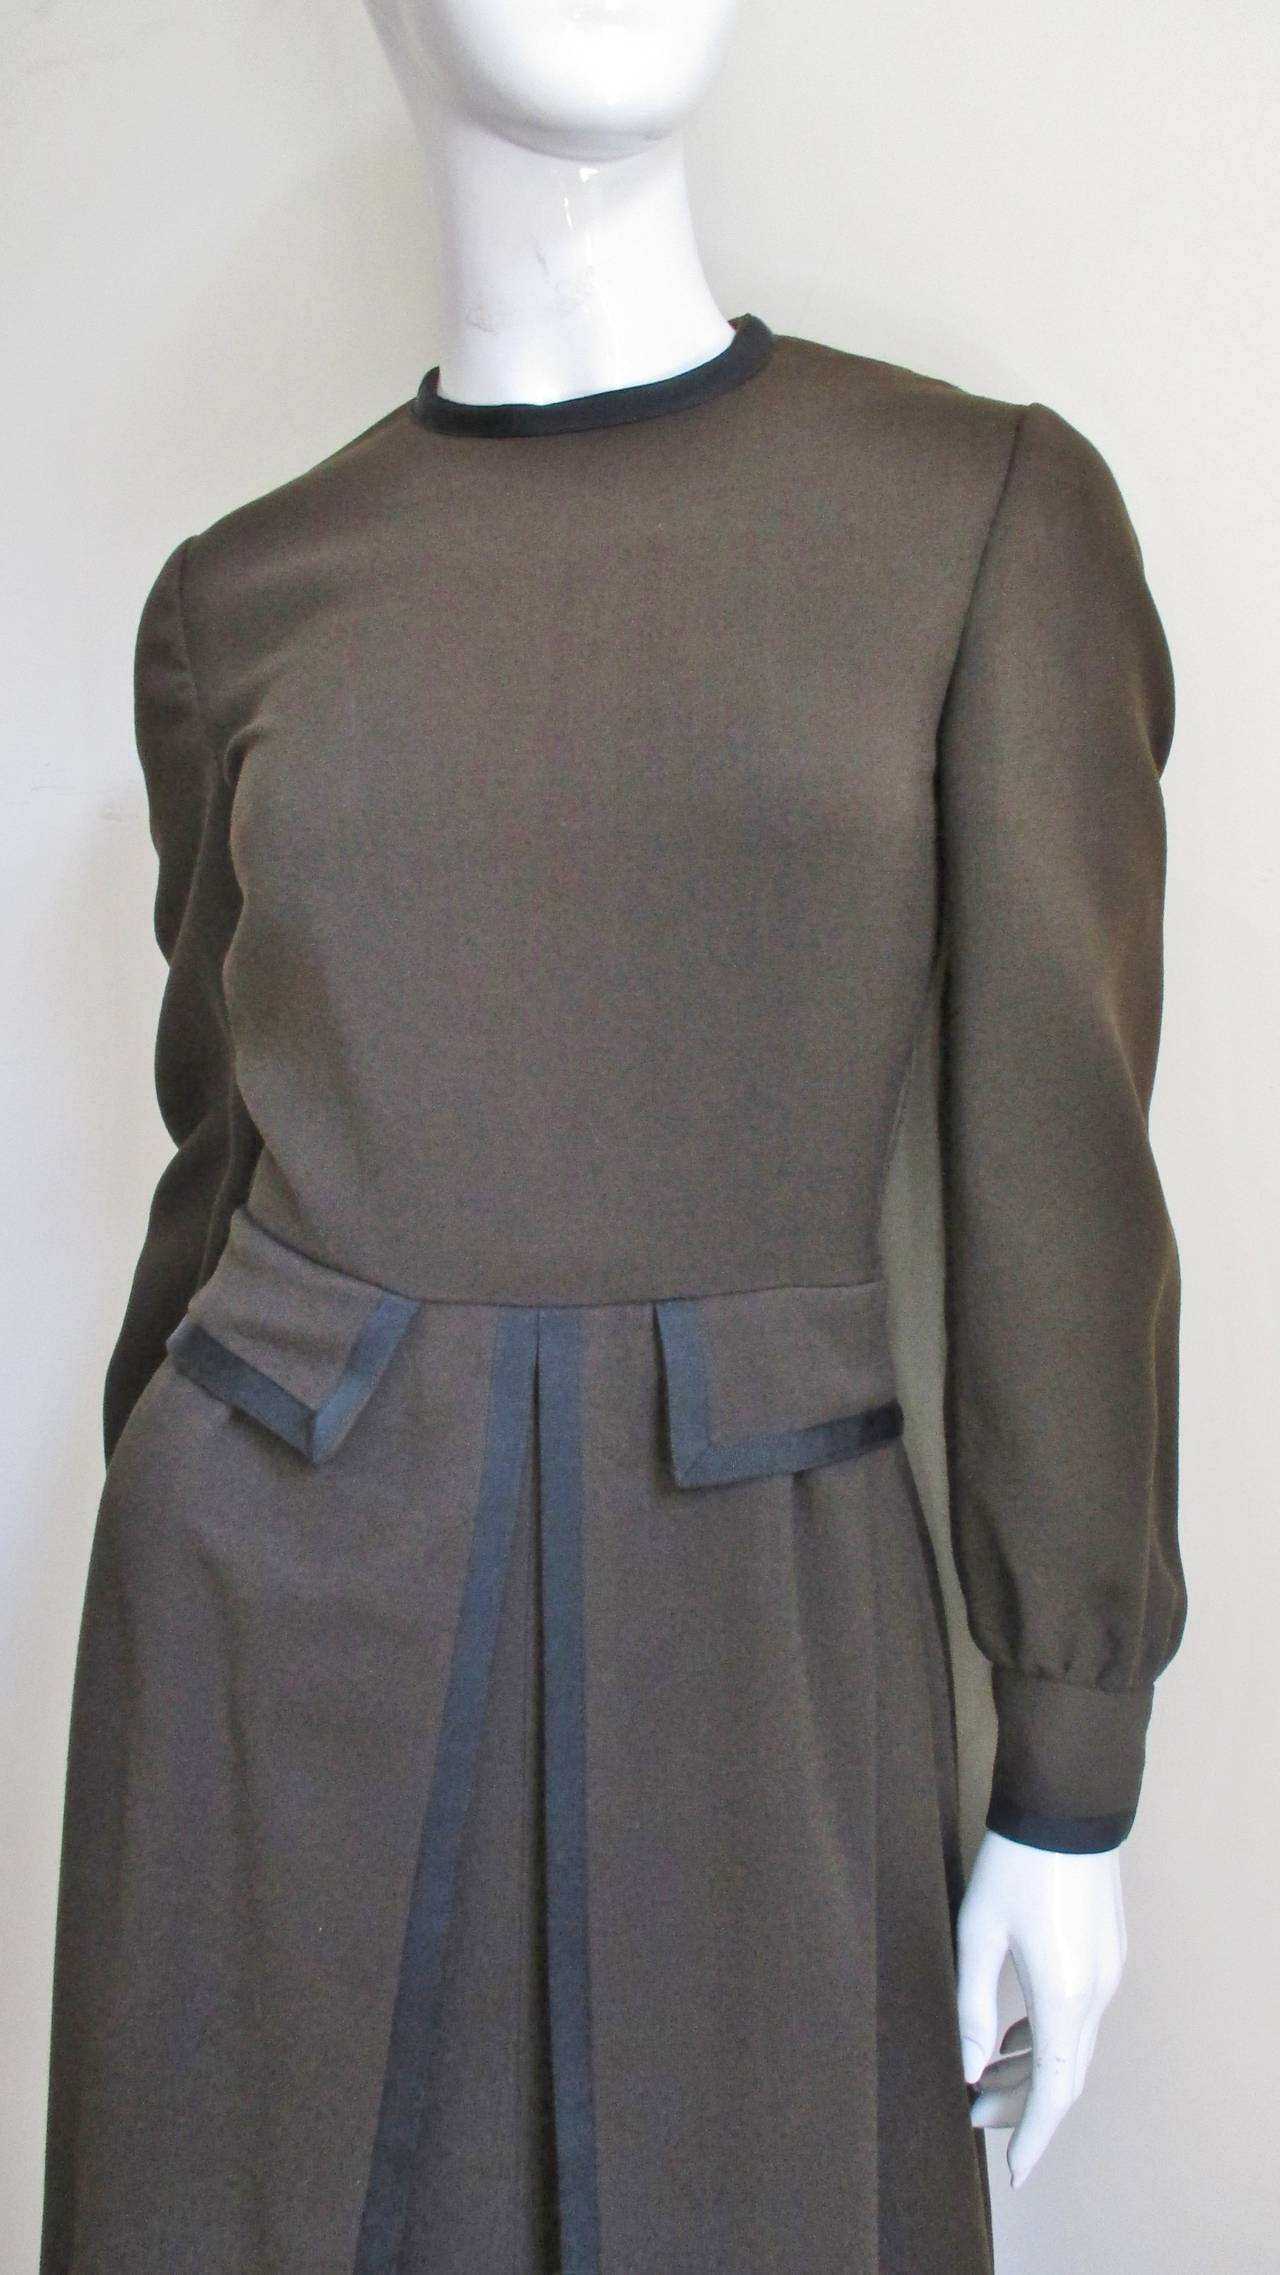 Iconic Geoffrey Beene 1970's Dress 2